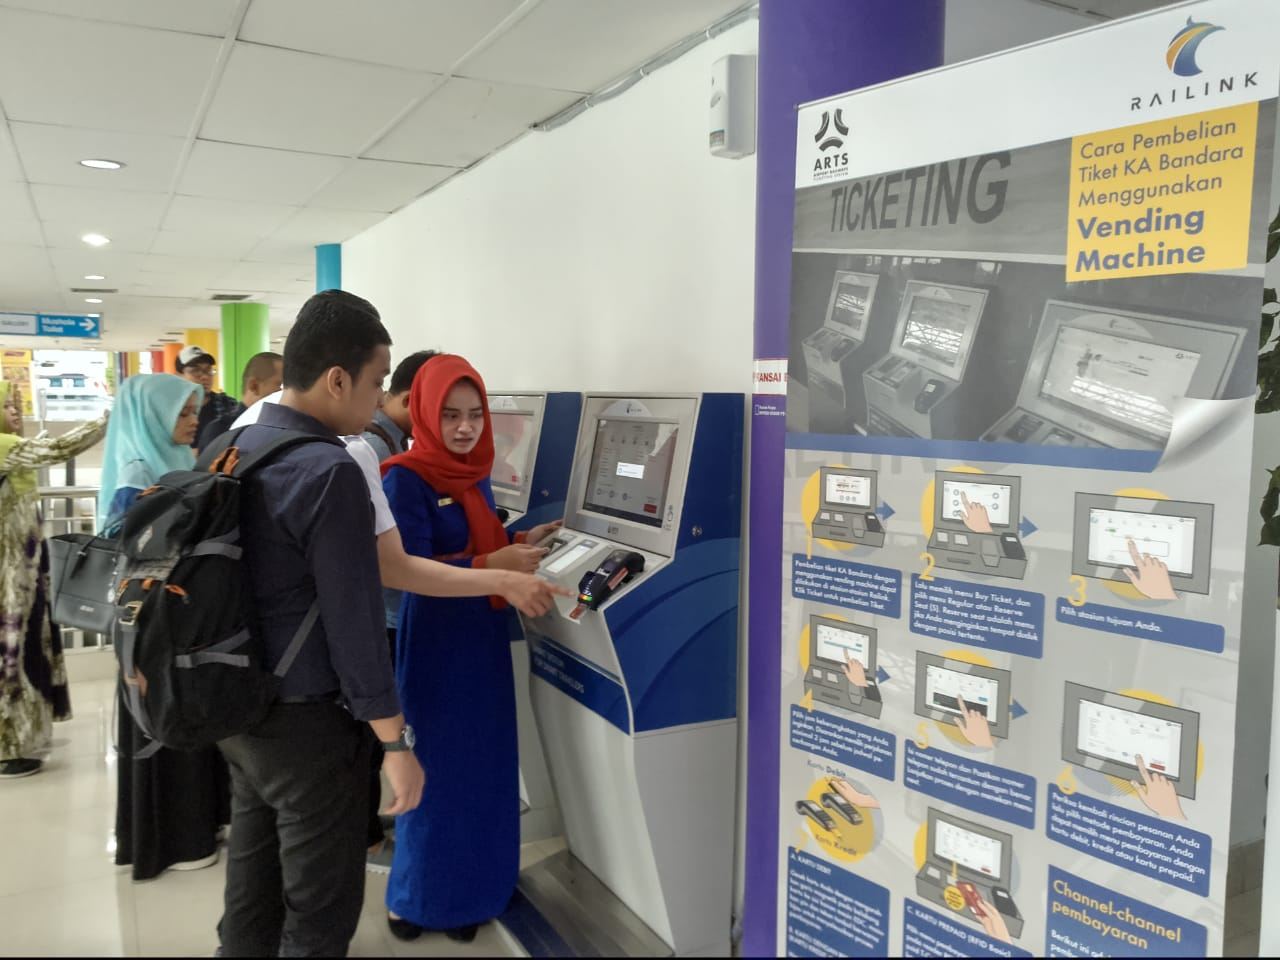 1 Agustus, Transaksi Non Tunai di KA Bandara Kualanamu Diaktifkan